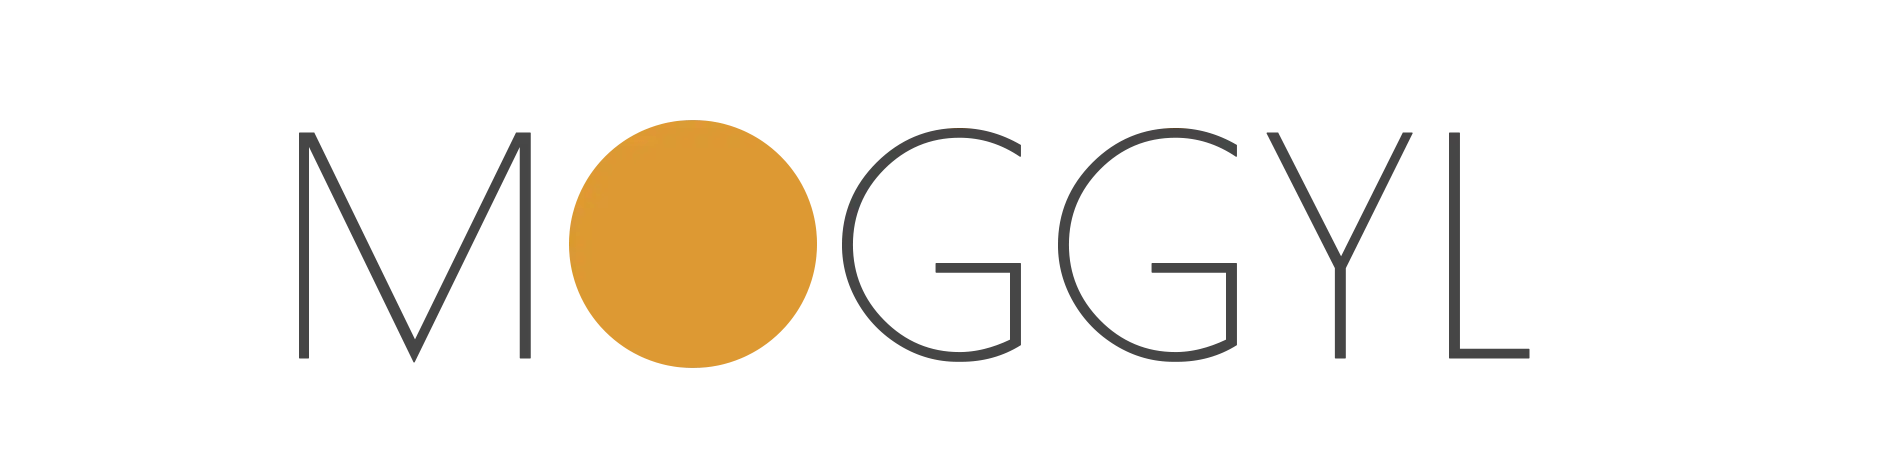 Logo Moggyl